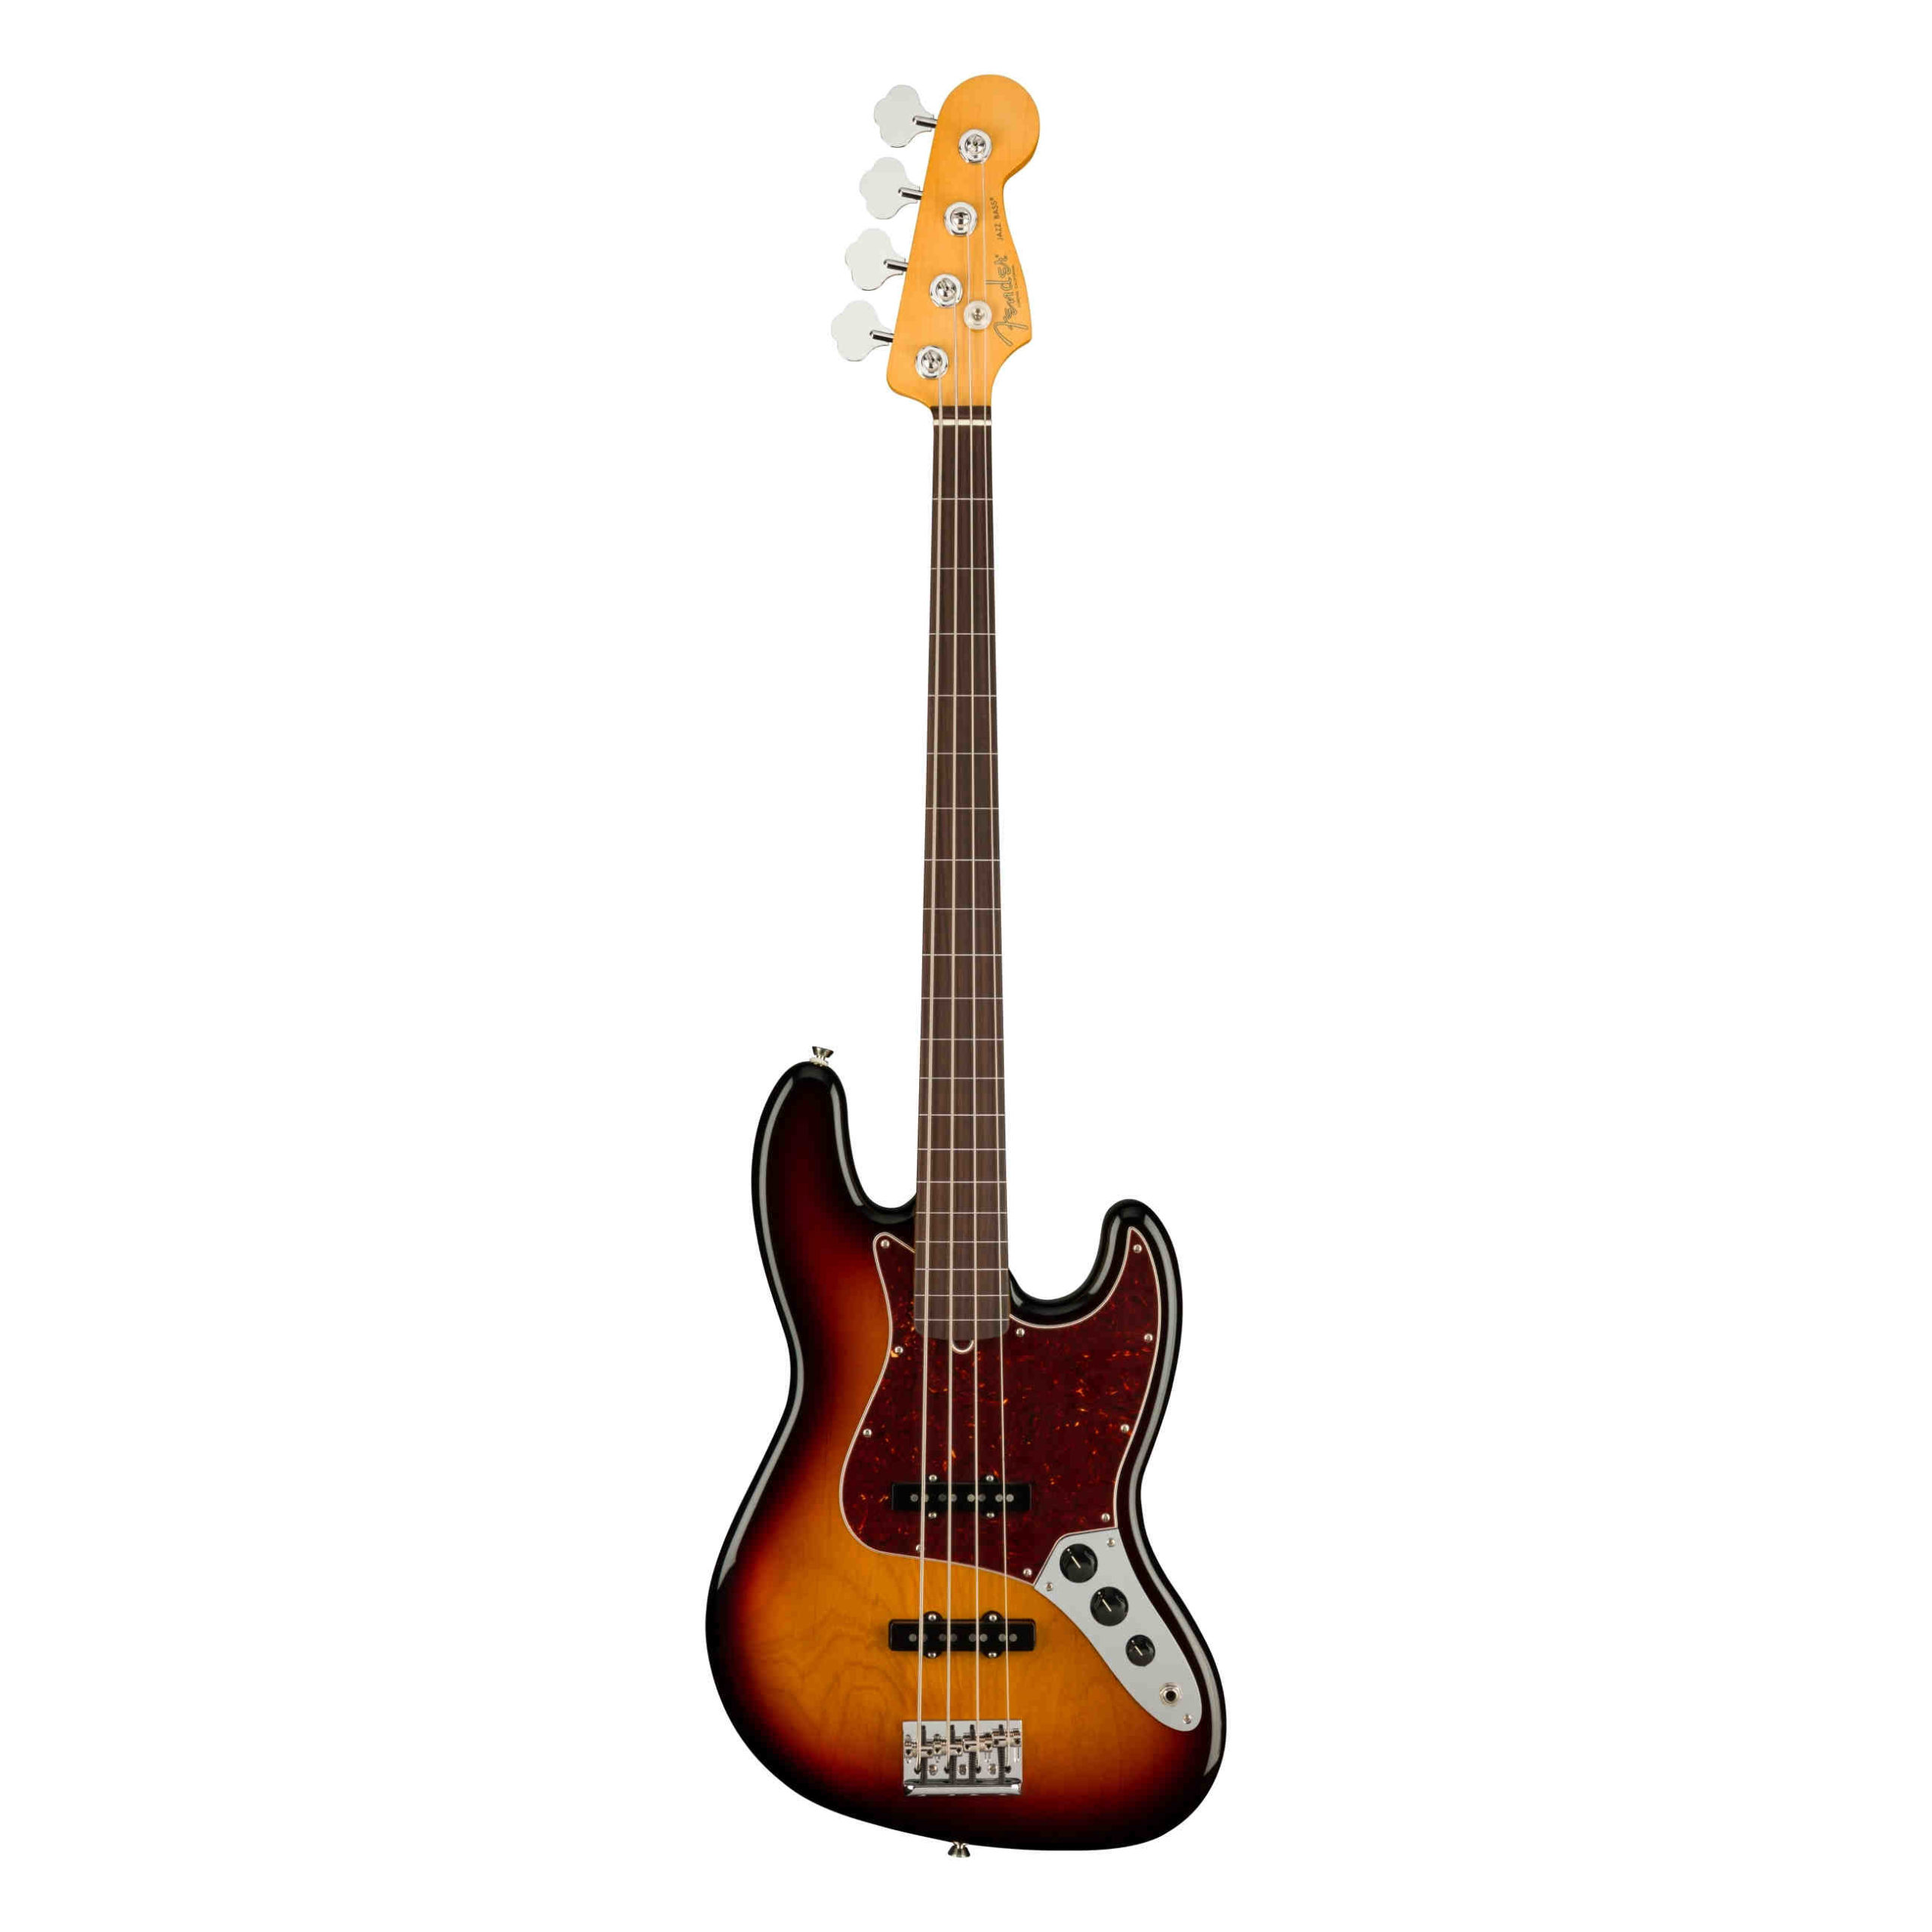 Fender American Professional II Jazz Bass® Fretless, Rosewood Fingerboard, 3-Color Sunburst